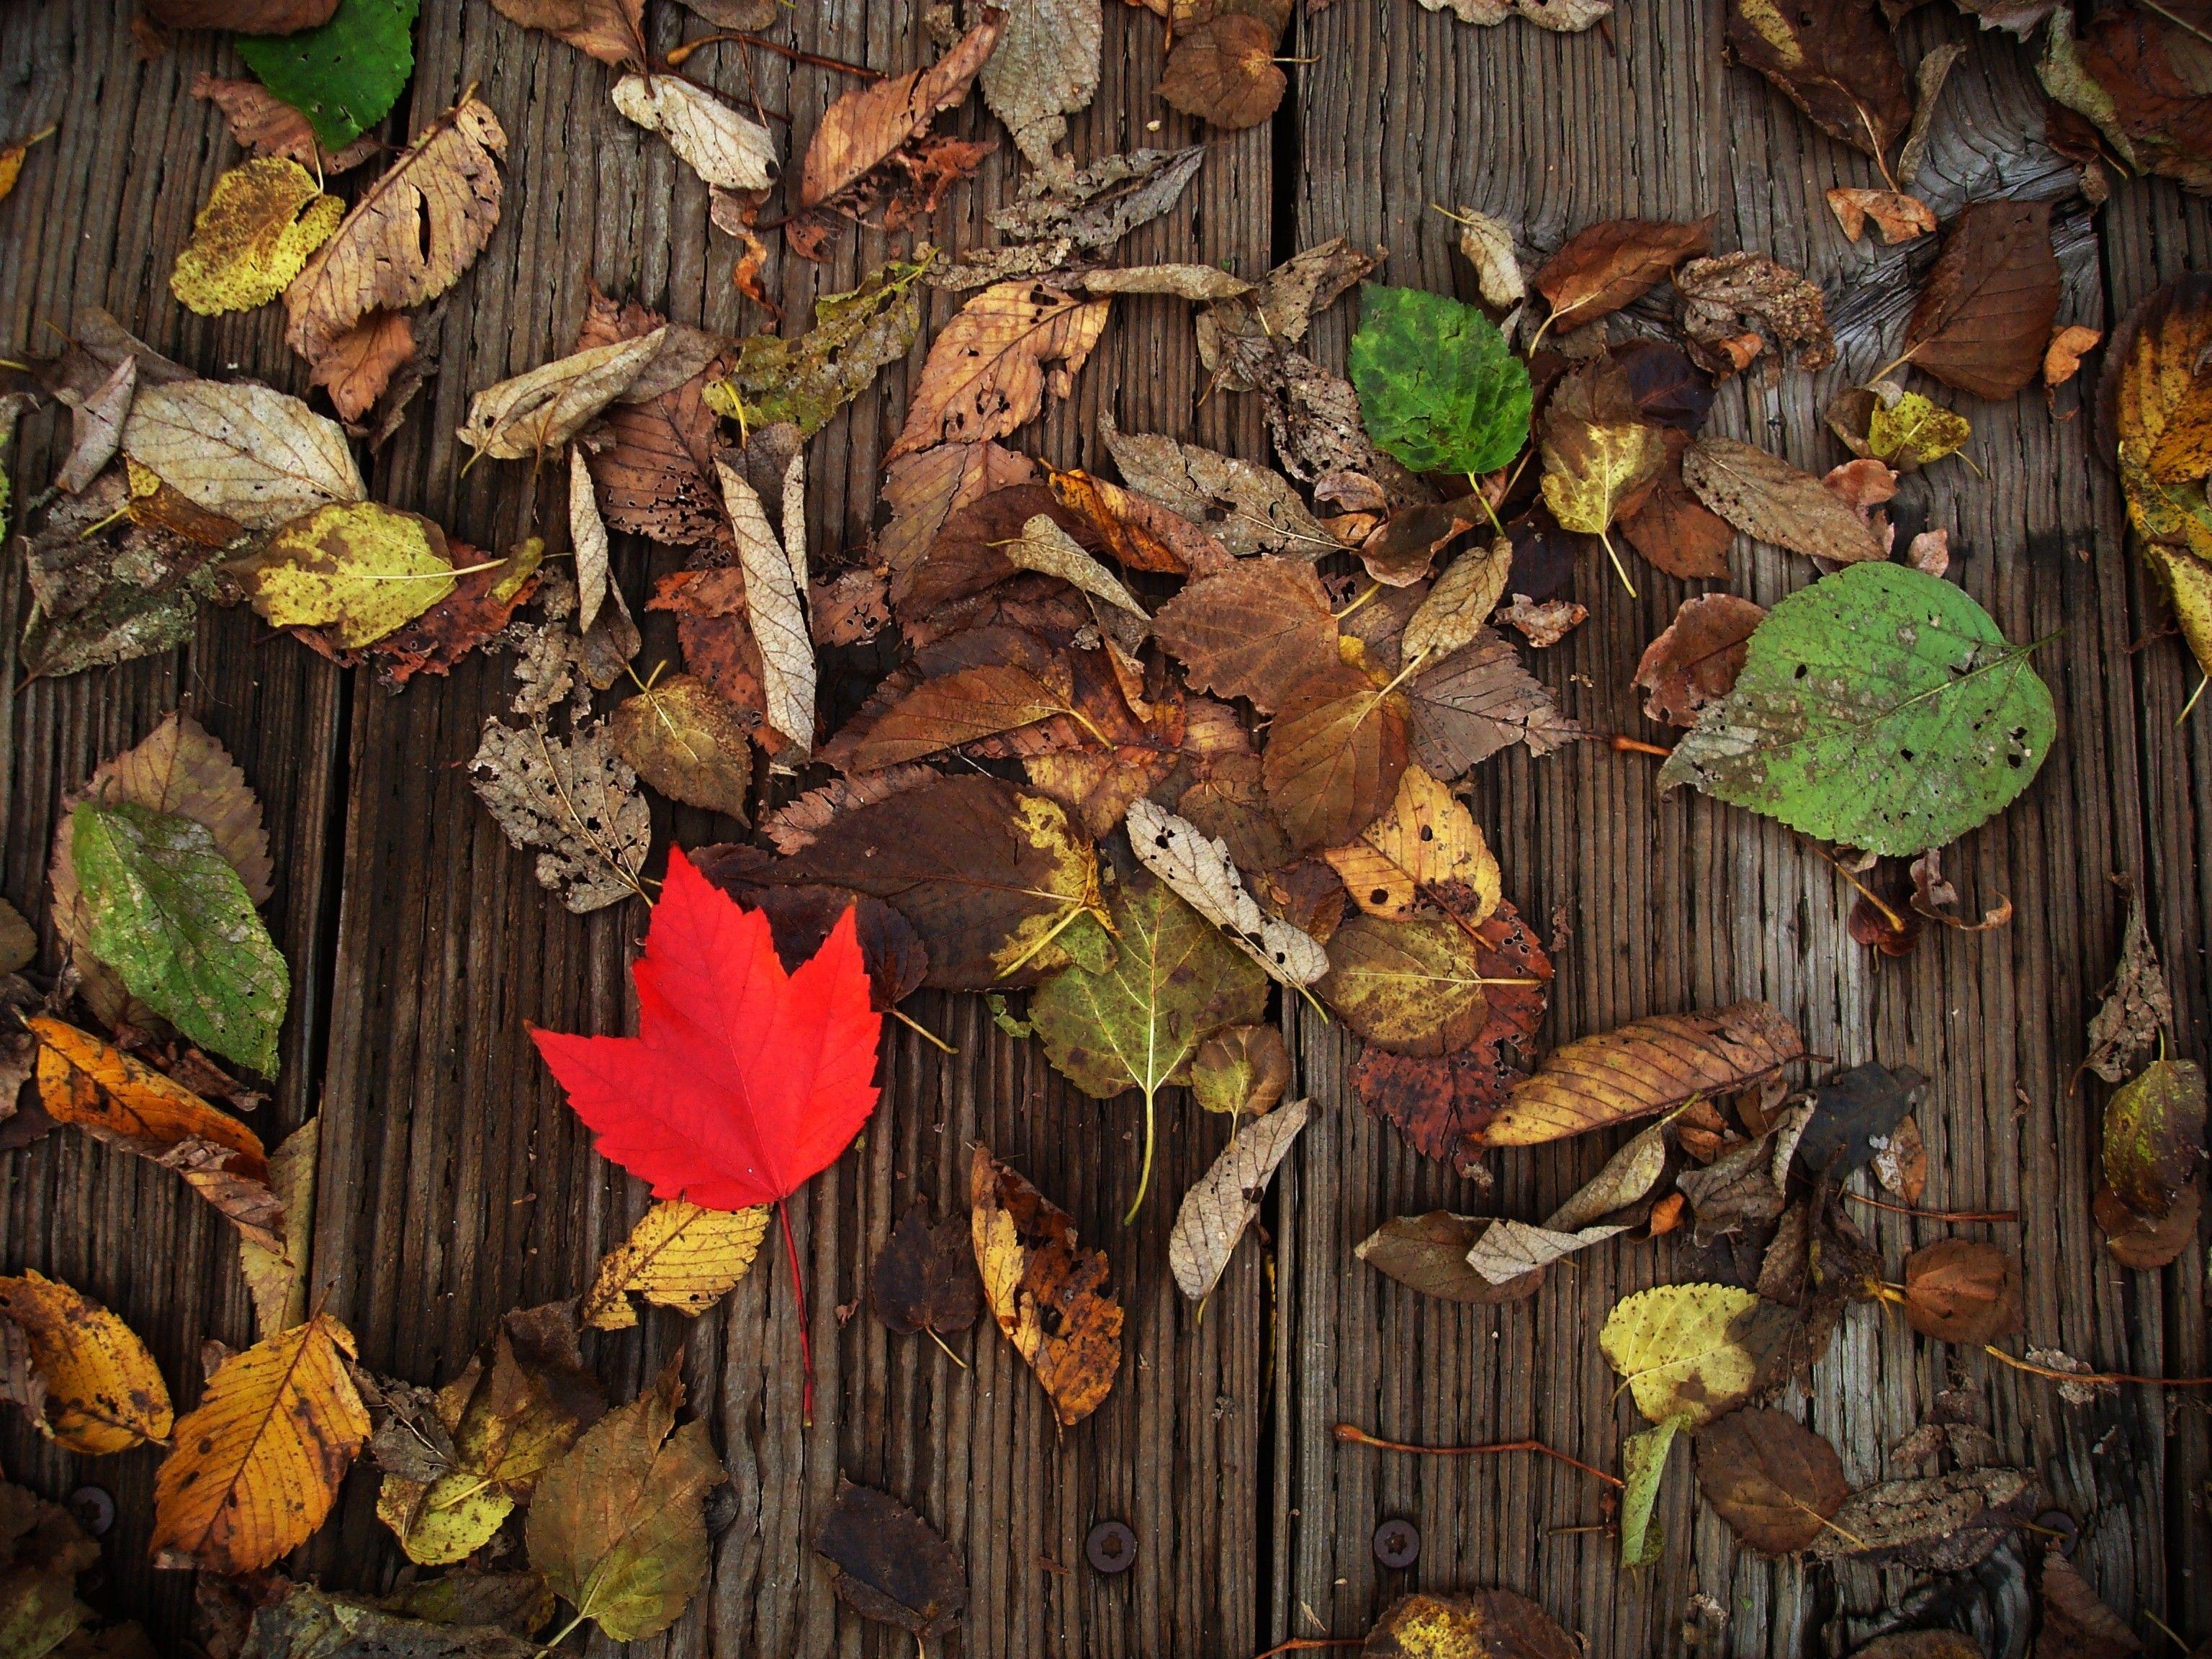 A red leaf lying among older fallen leaves on wooden boards.